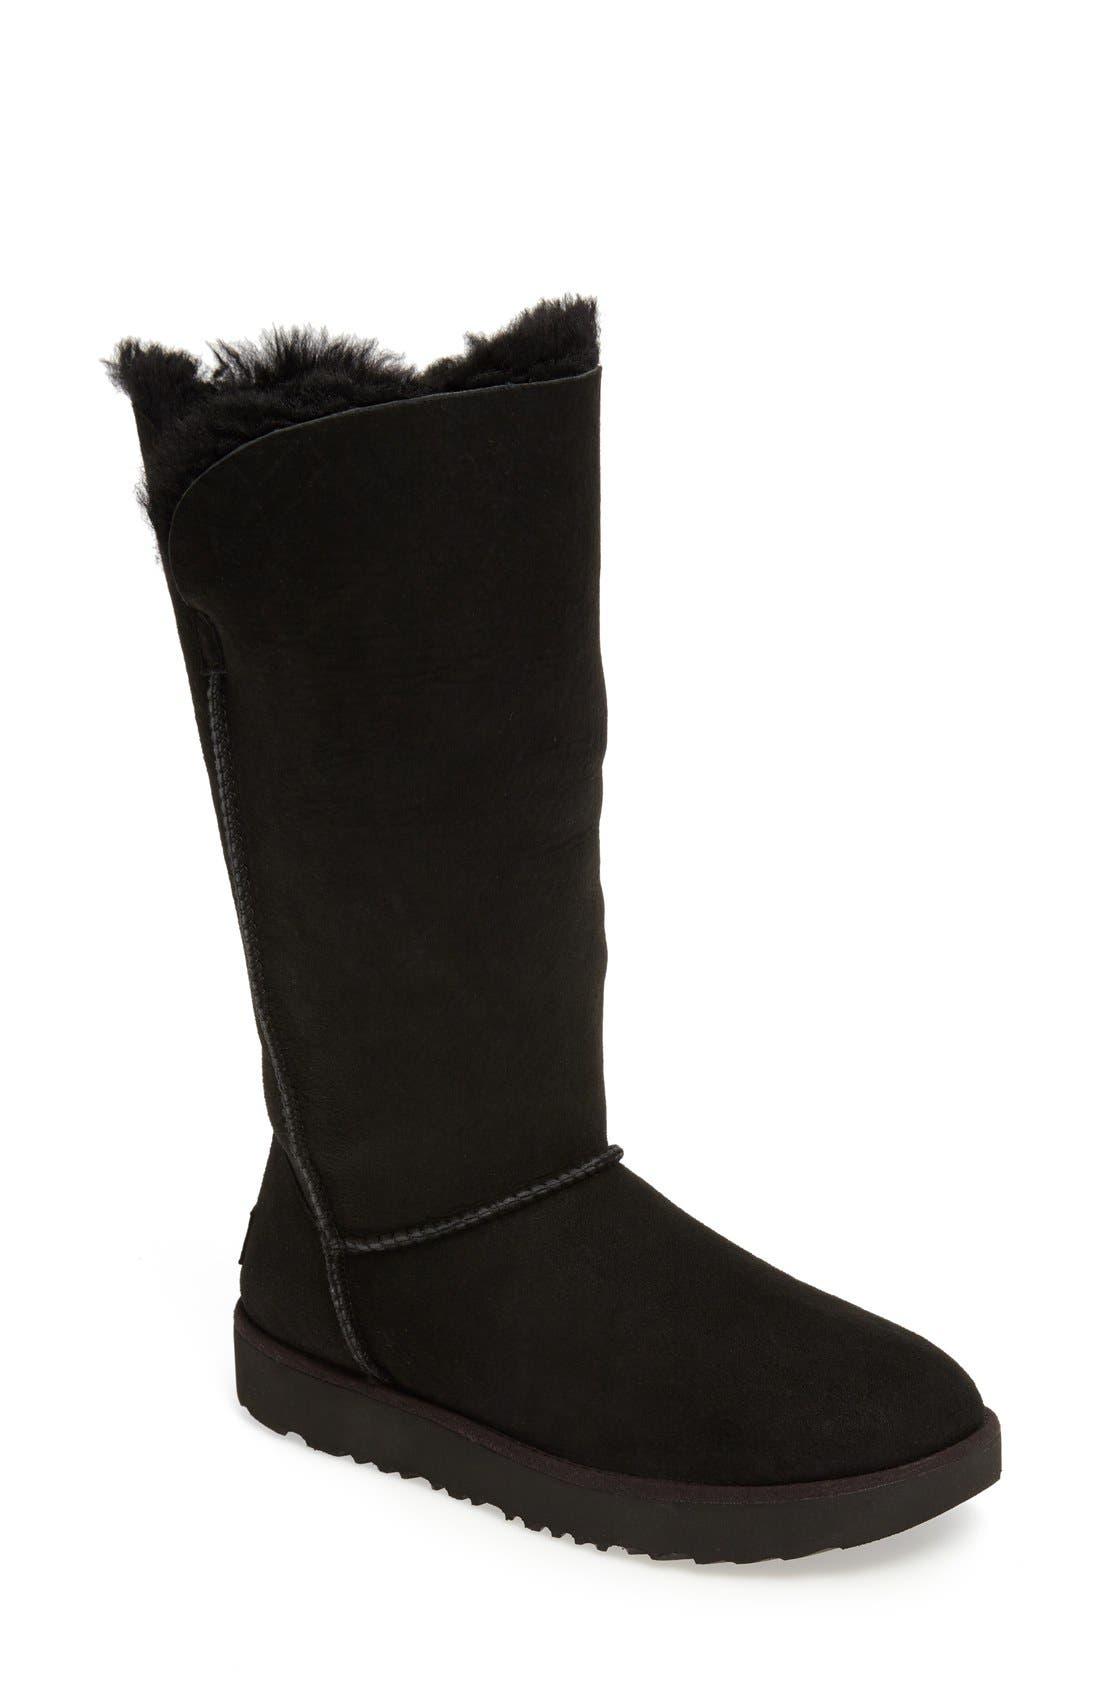 Main Image - UGG® Classic Cuff Tall Boot (Women)